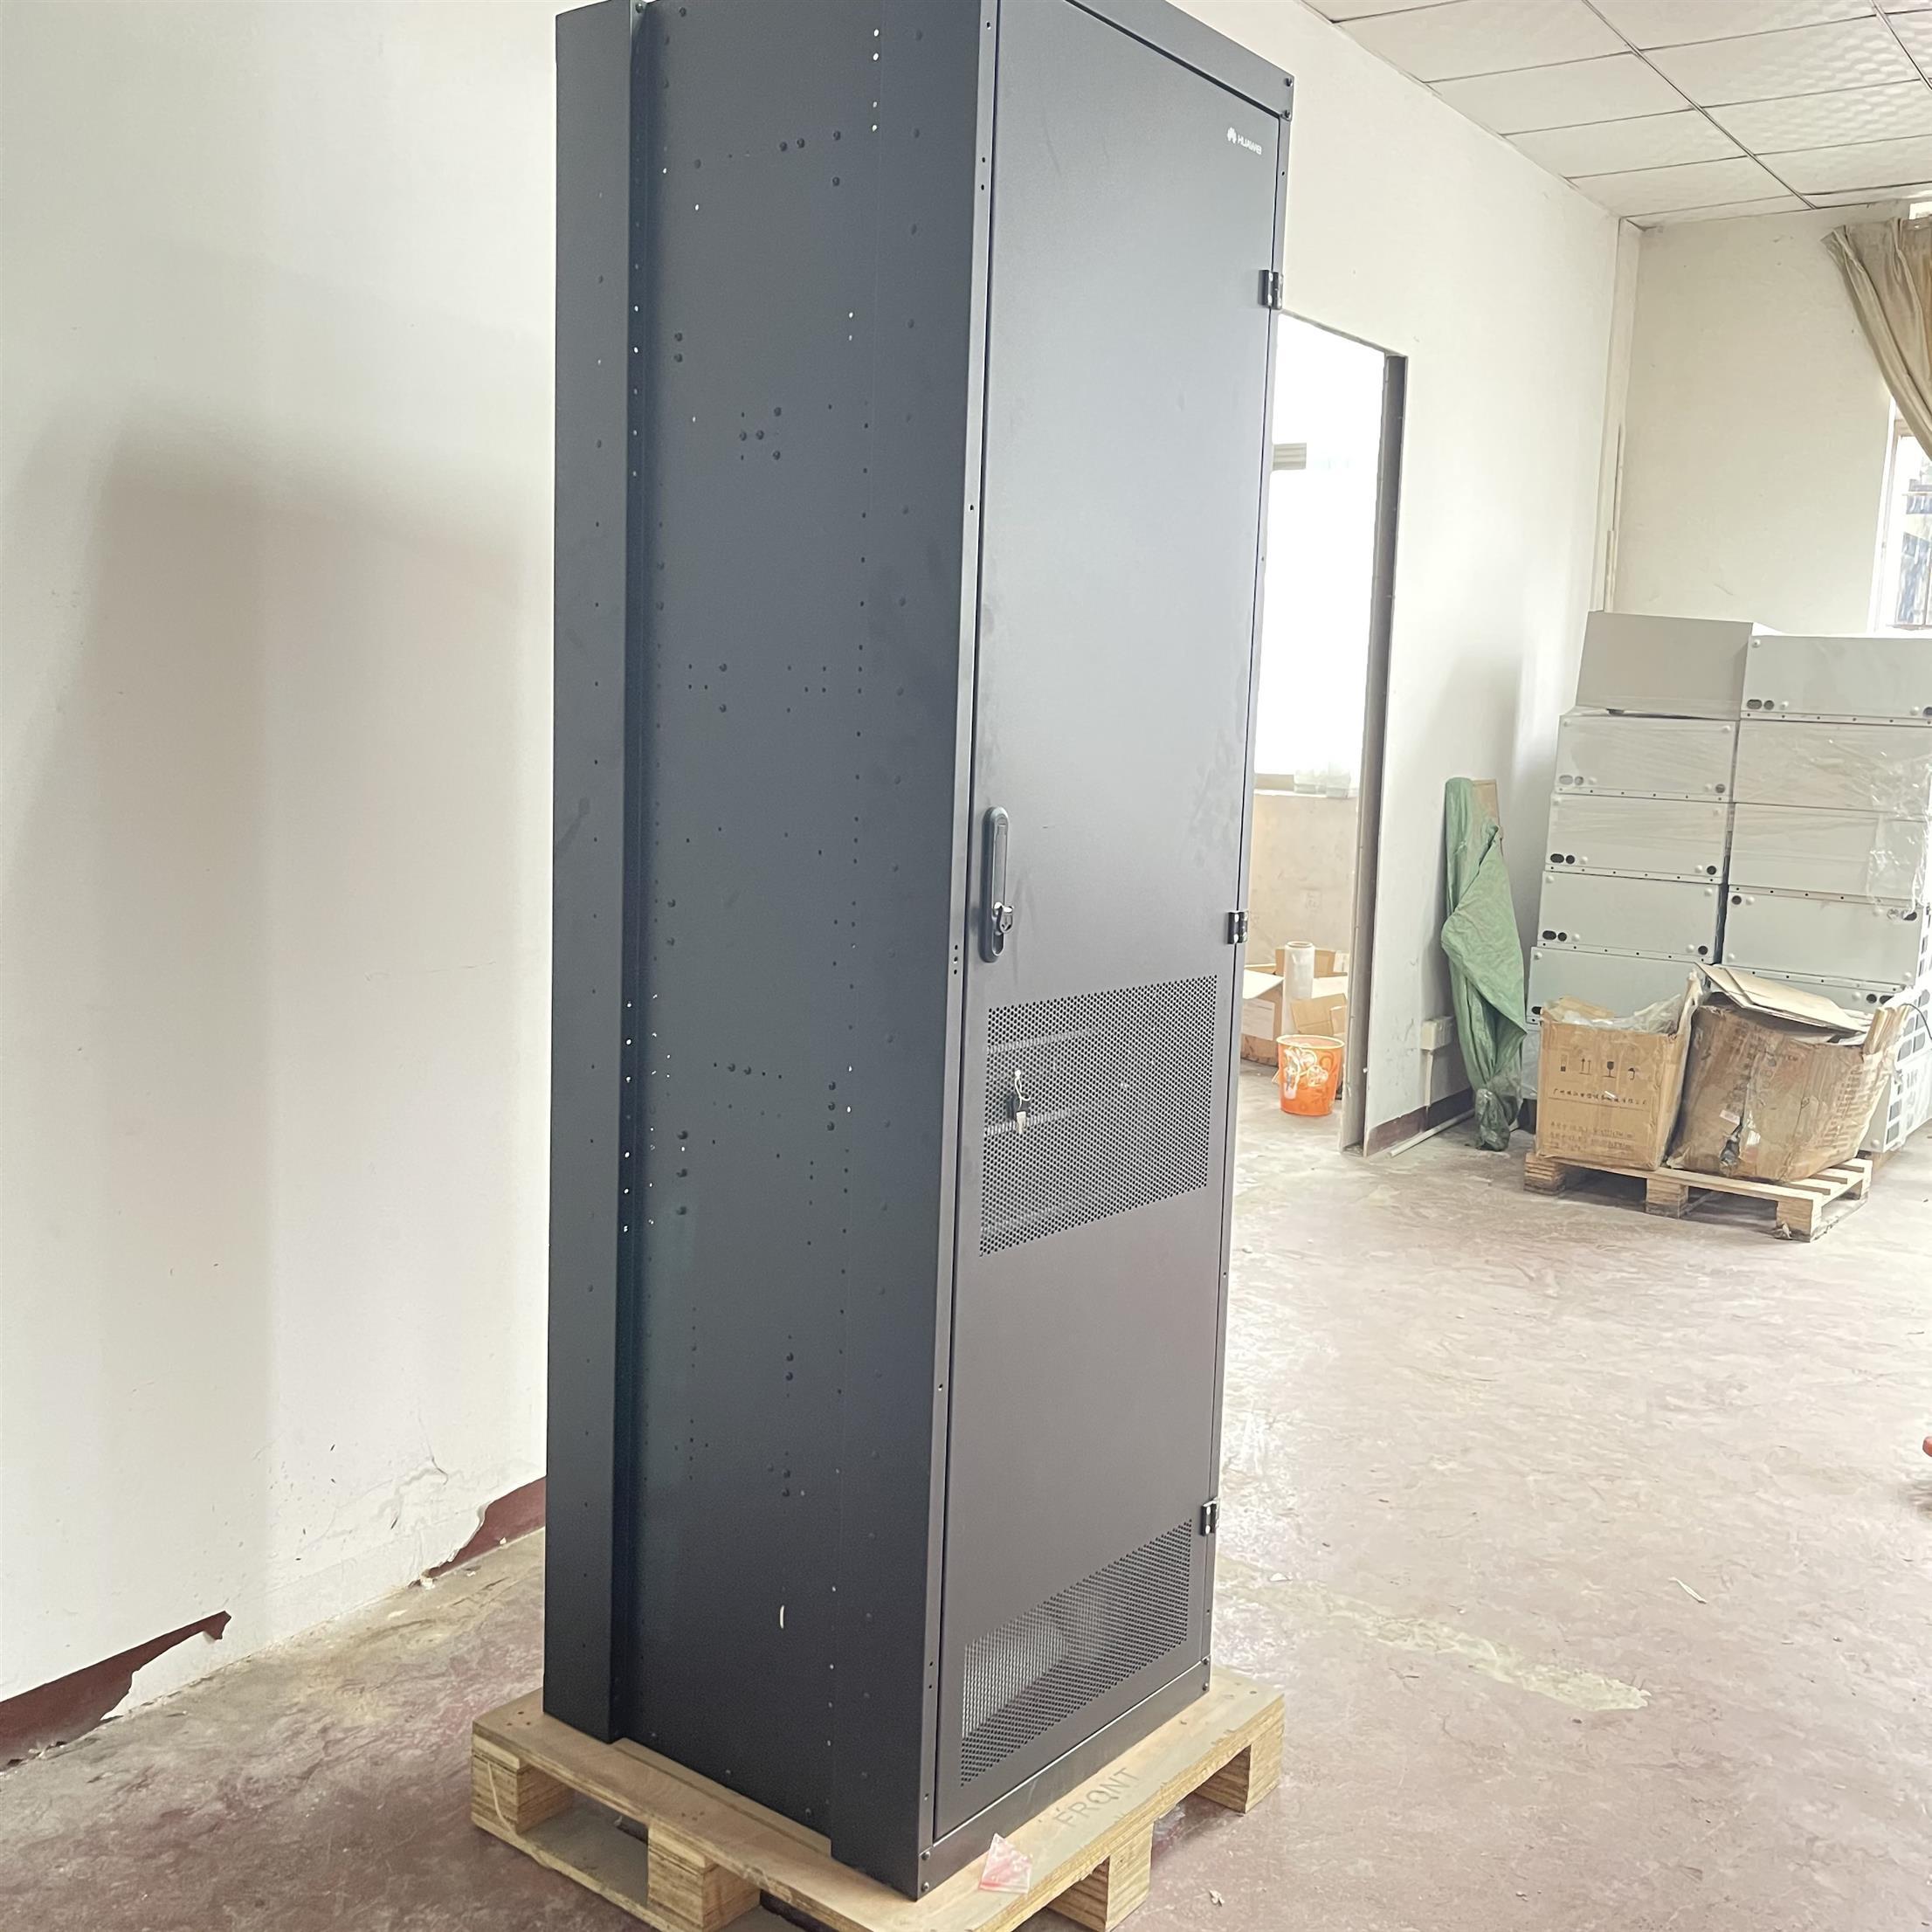 呼和浩特HUAWEITP48300T-N20A8 300A機柜